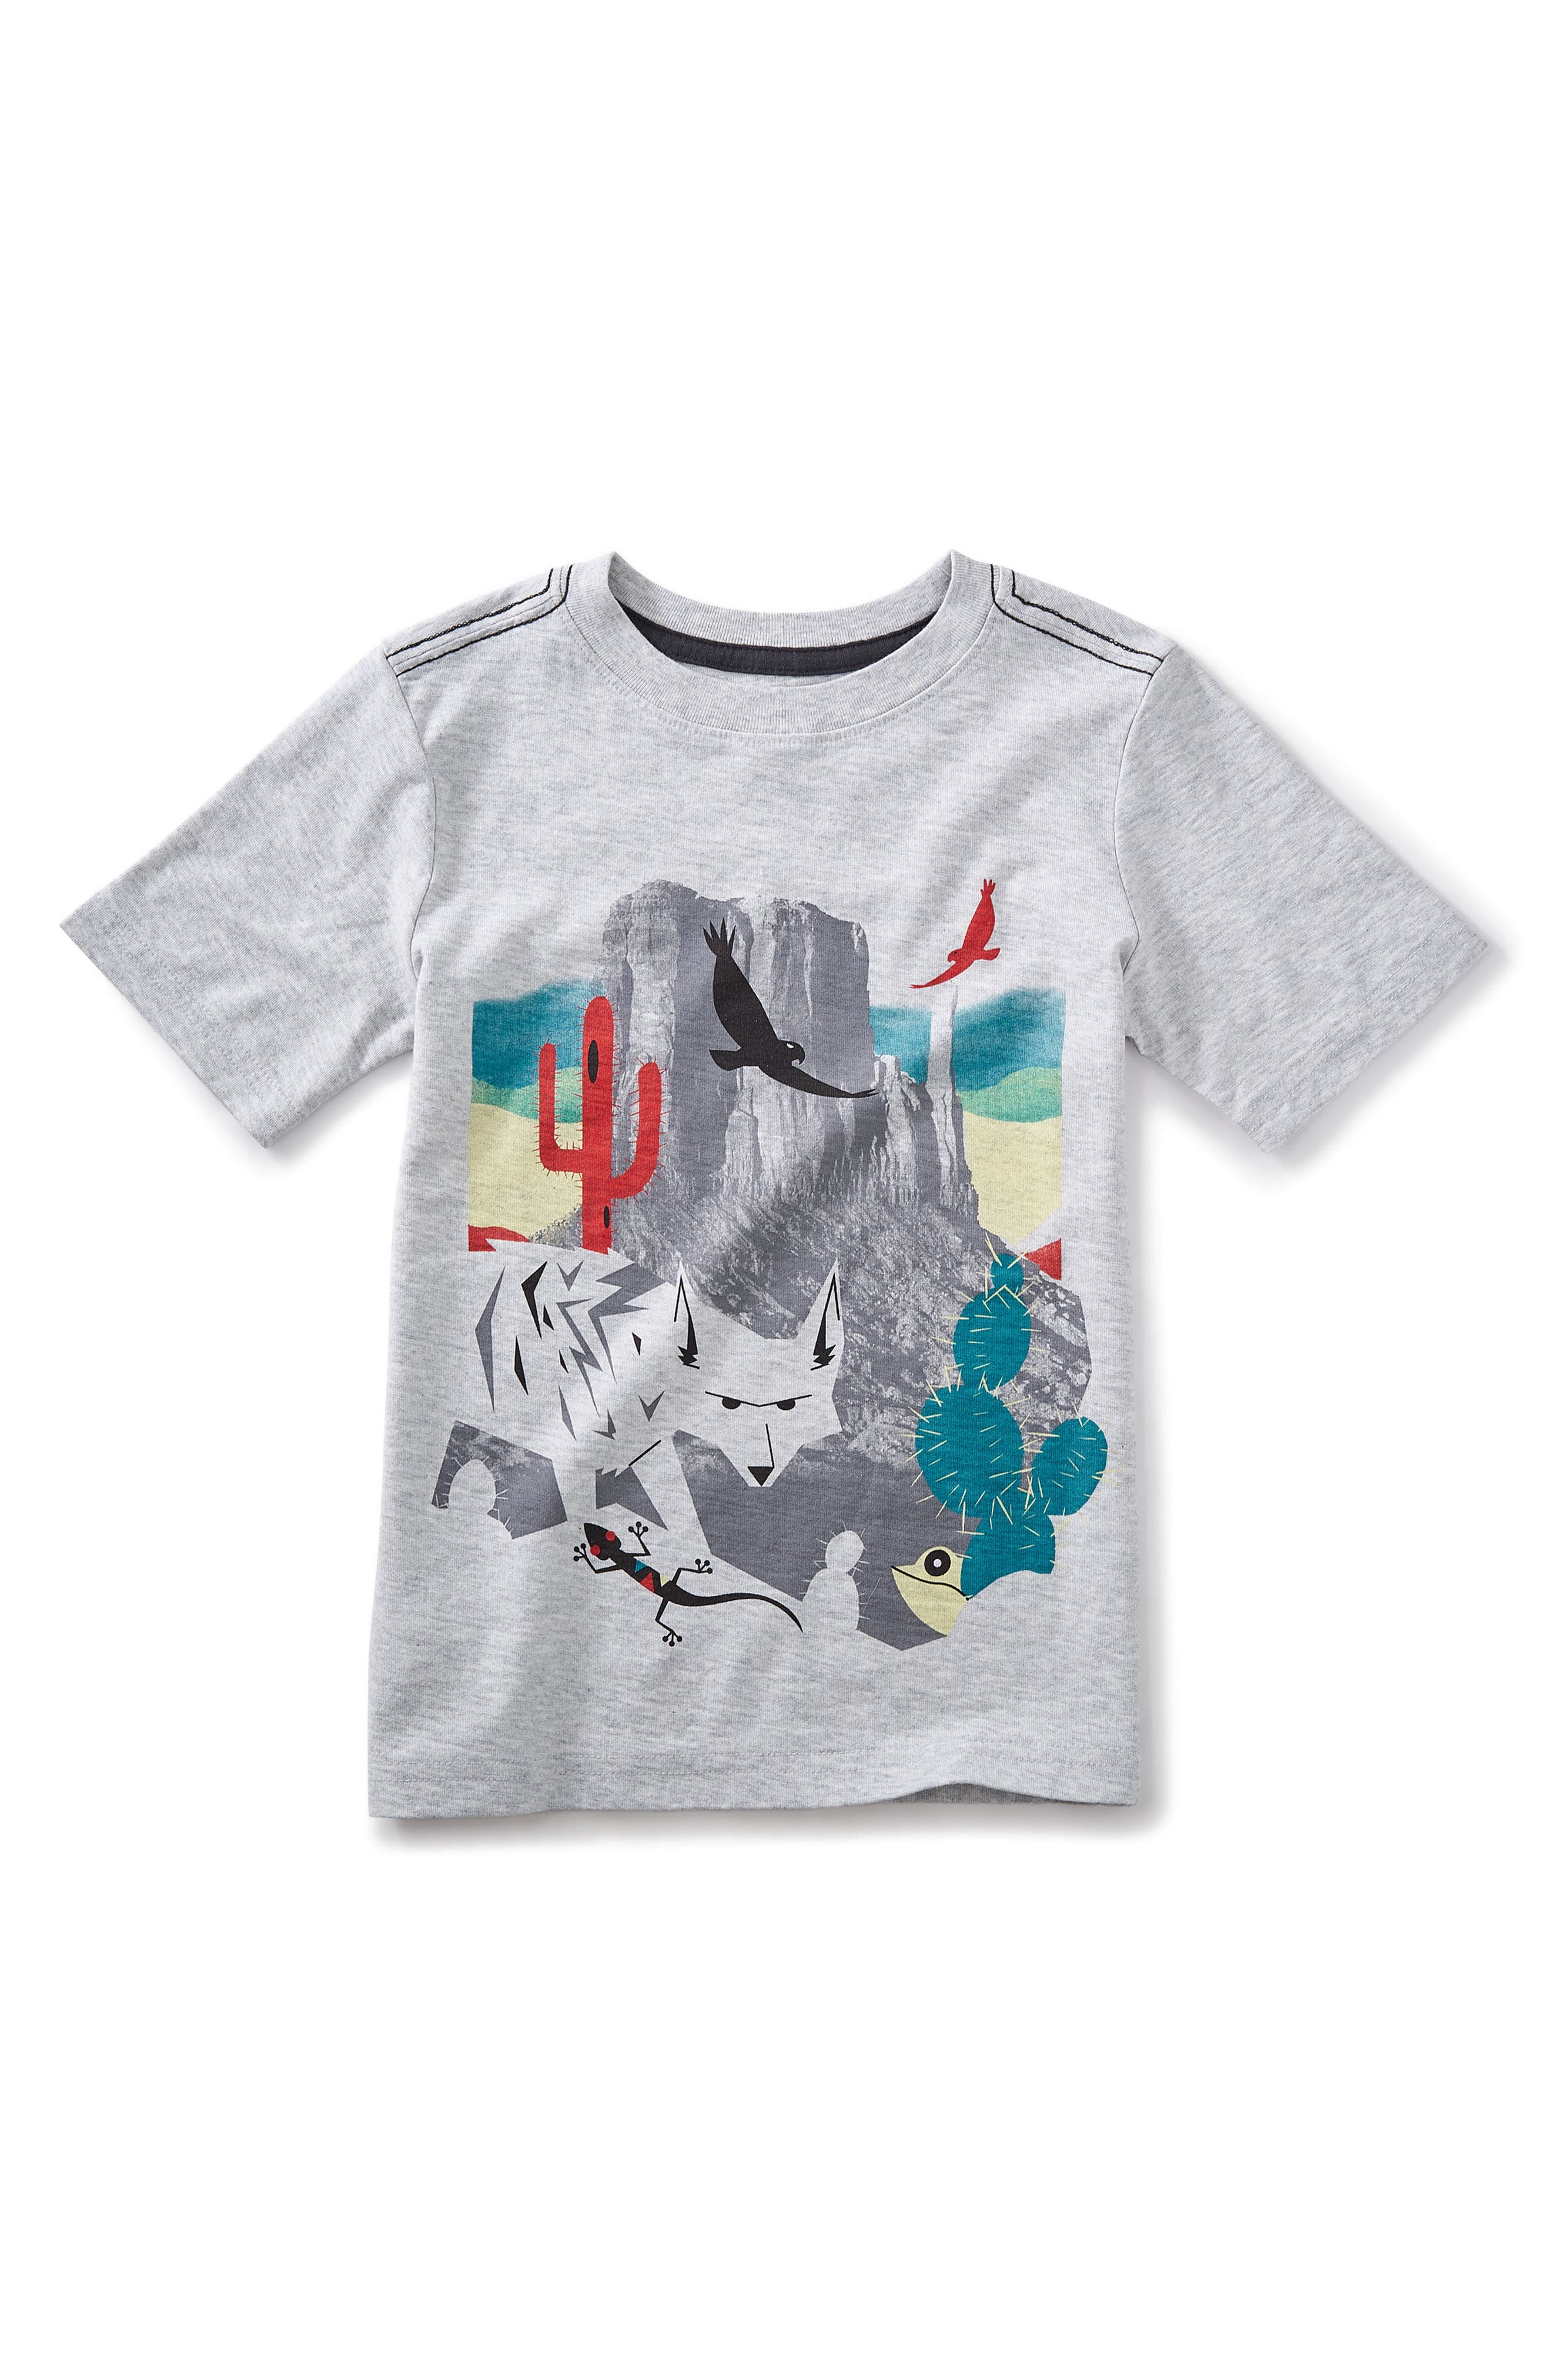 Canyon Lands Graphic T-Shirt,                         Main,                         color, 020